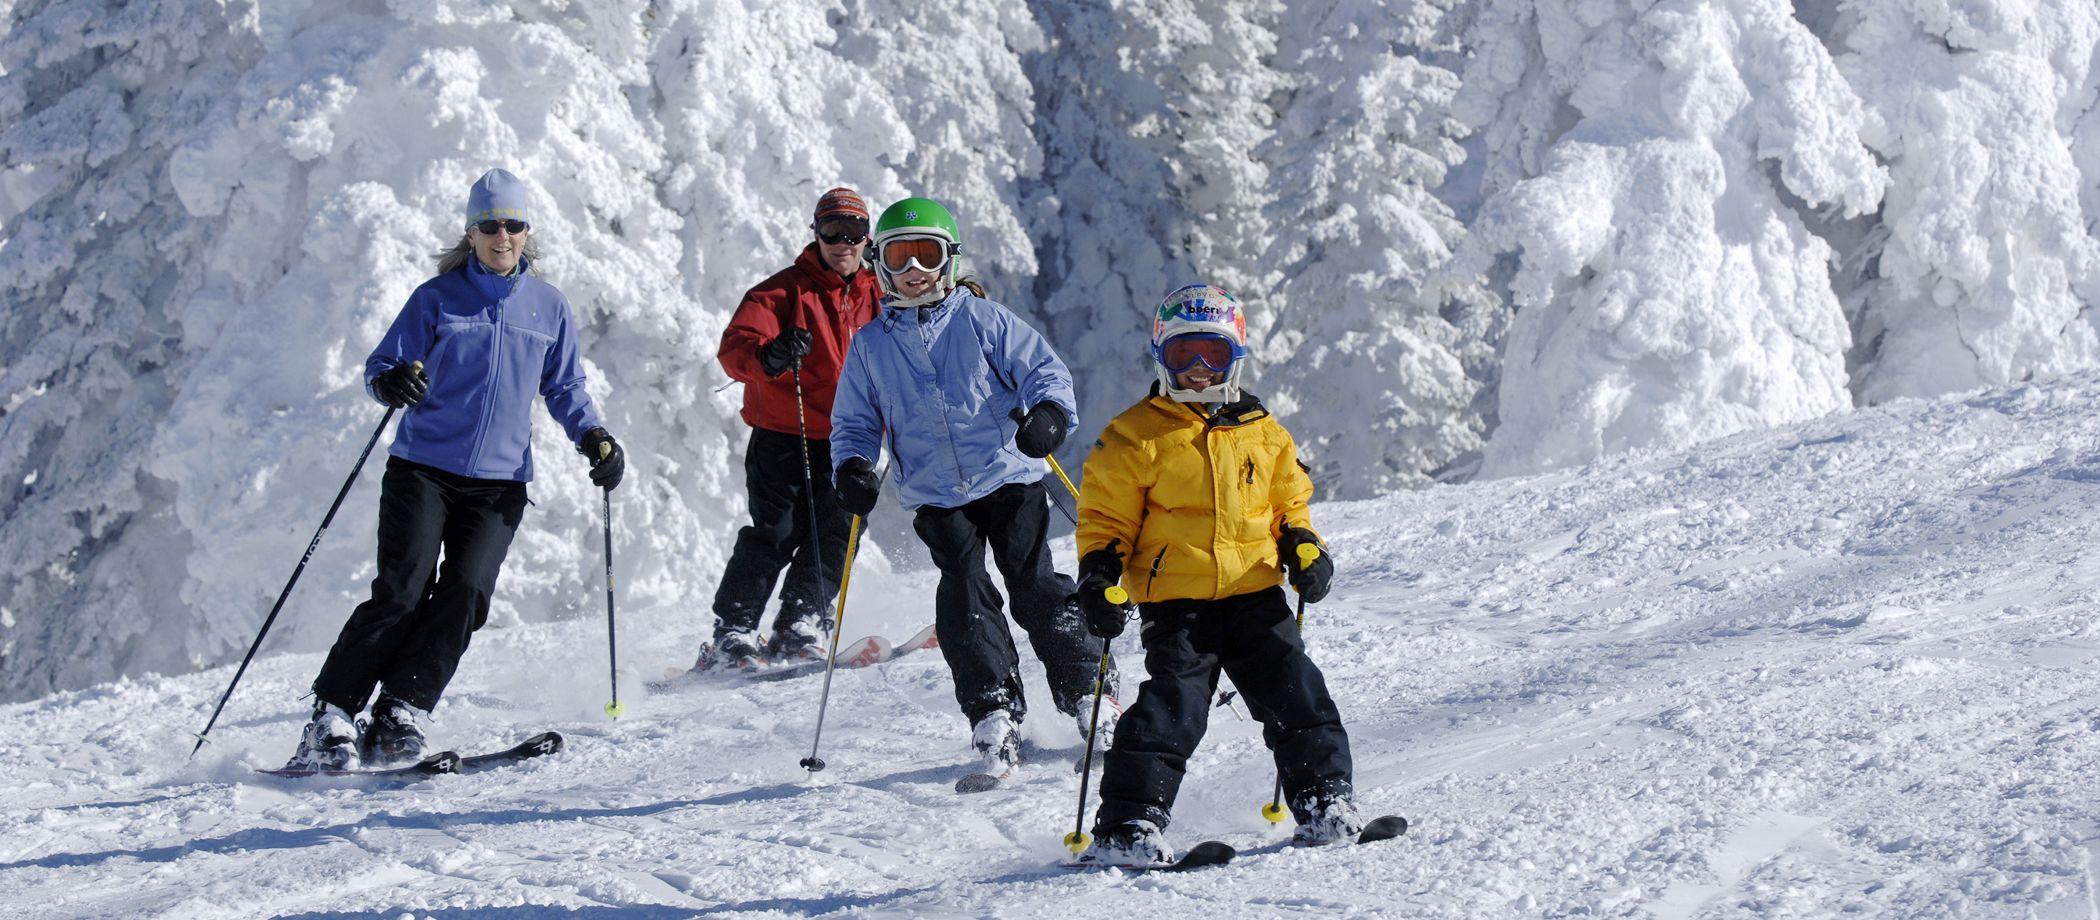 Skigruppe auf Abfahrt